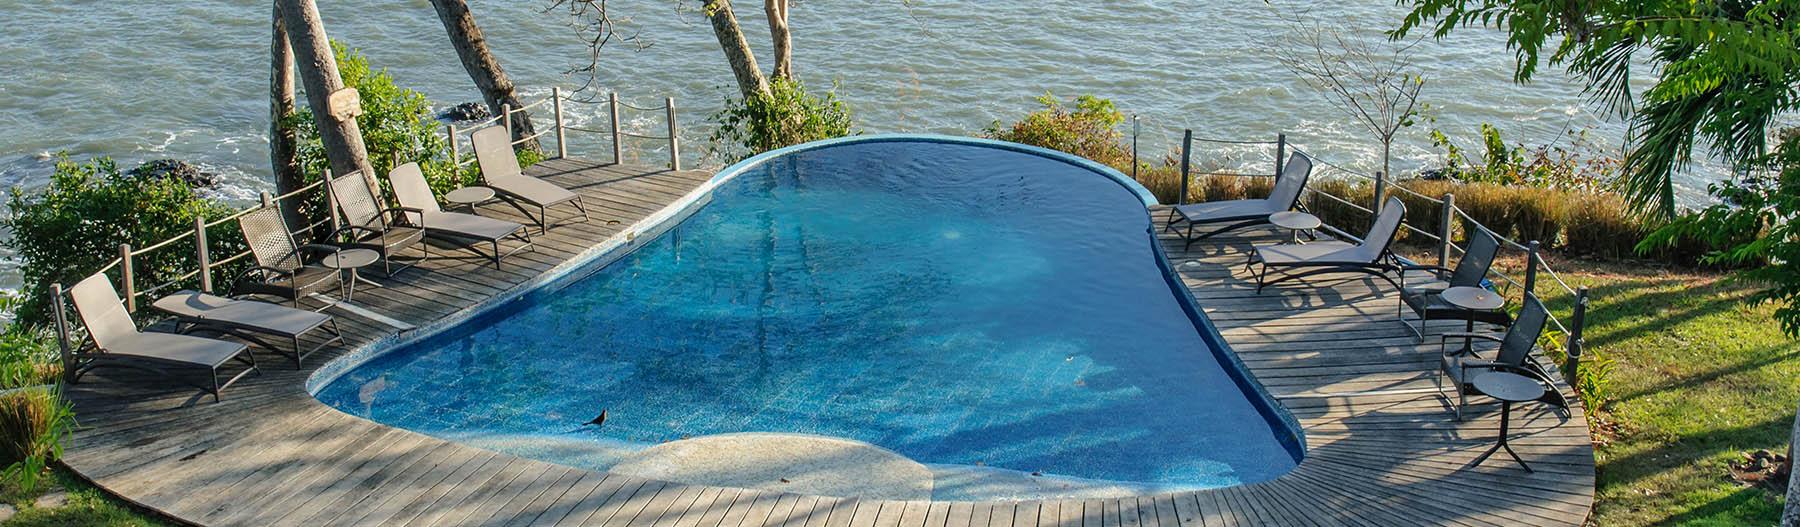 oceanside Panamanian pool